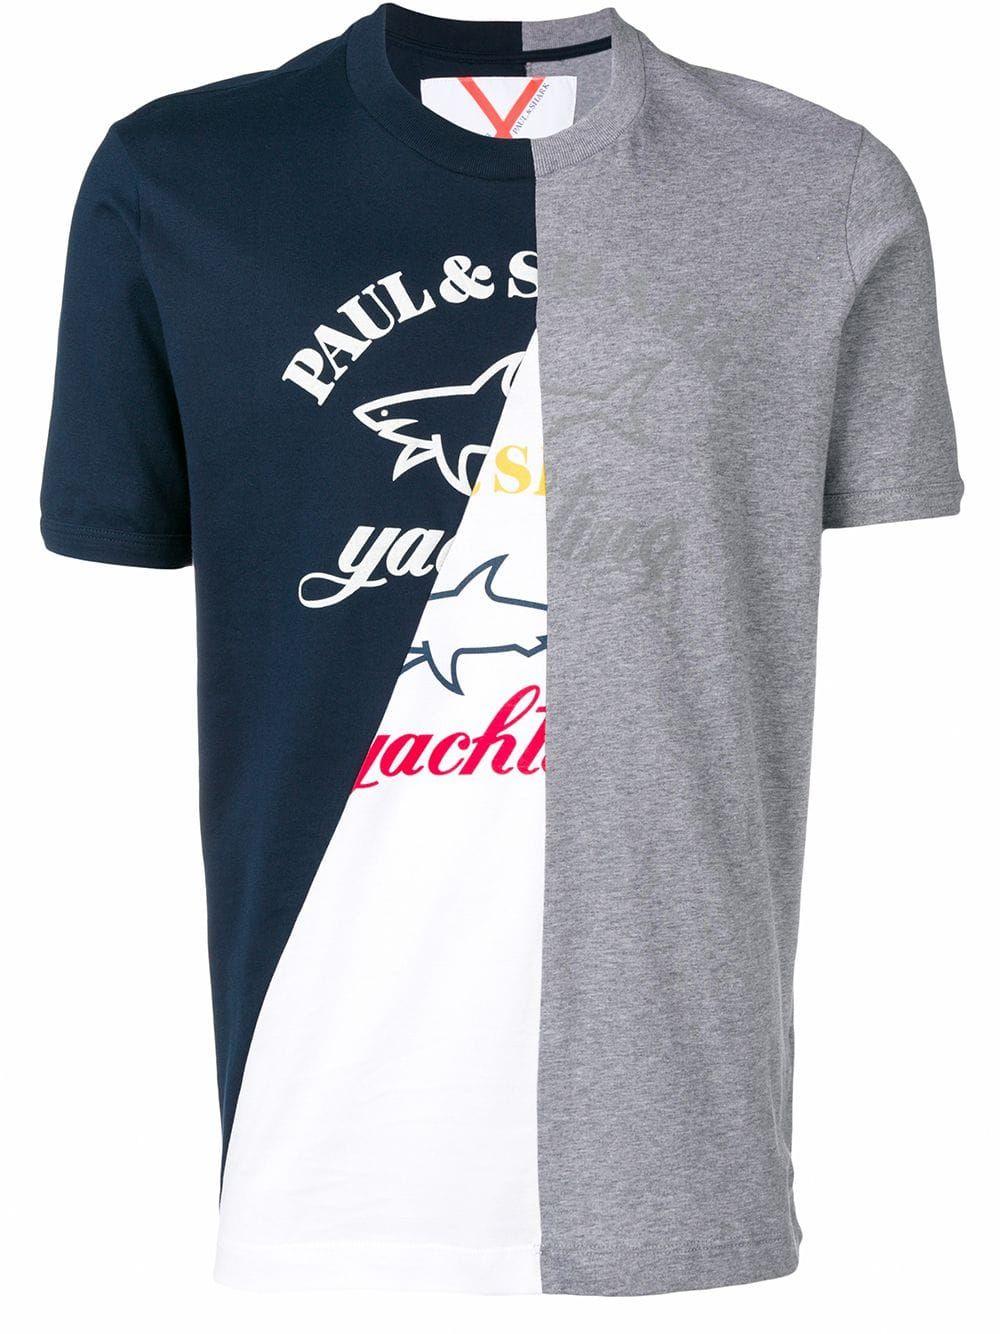 7d02a7d480d09d Paul & Shark colour-block logo T-shirt - Grey in 2019 | Products ...